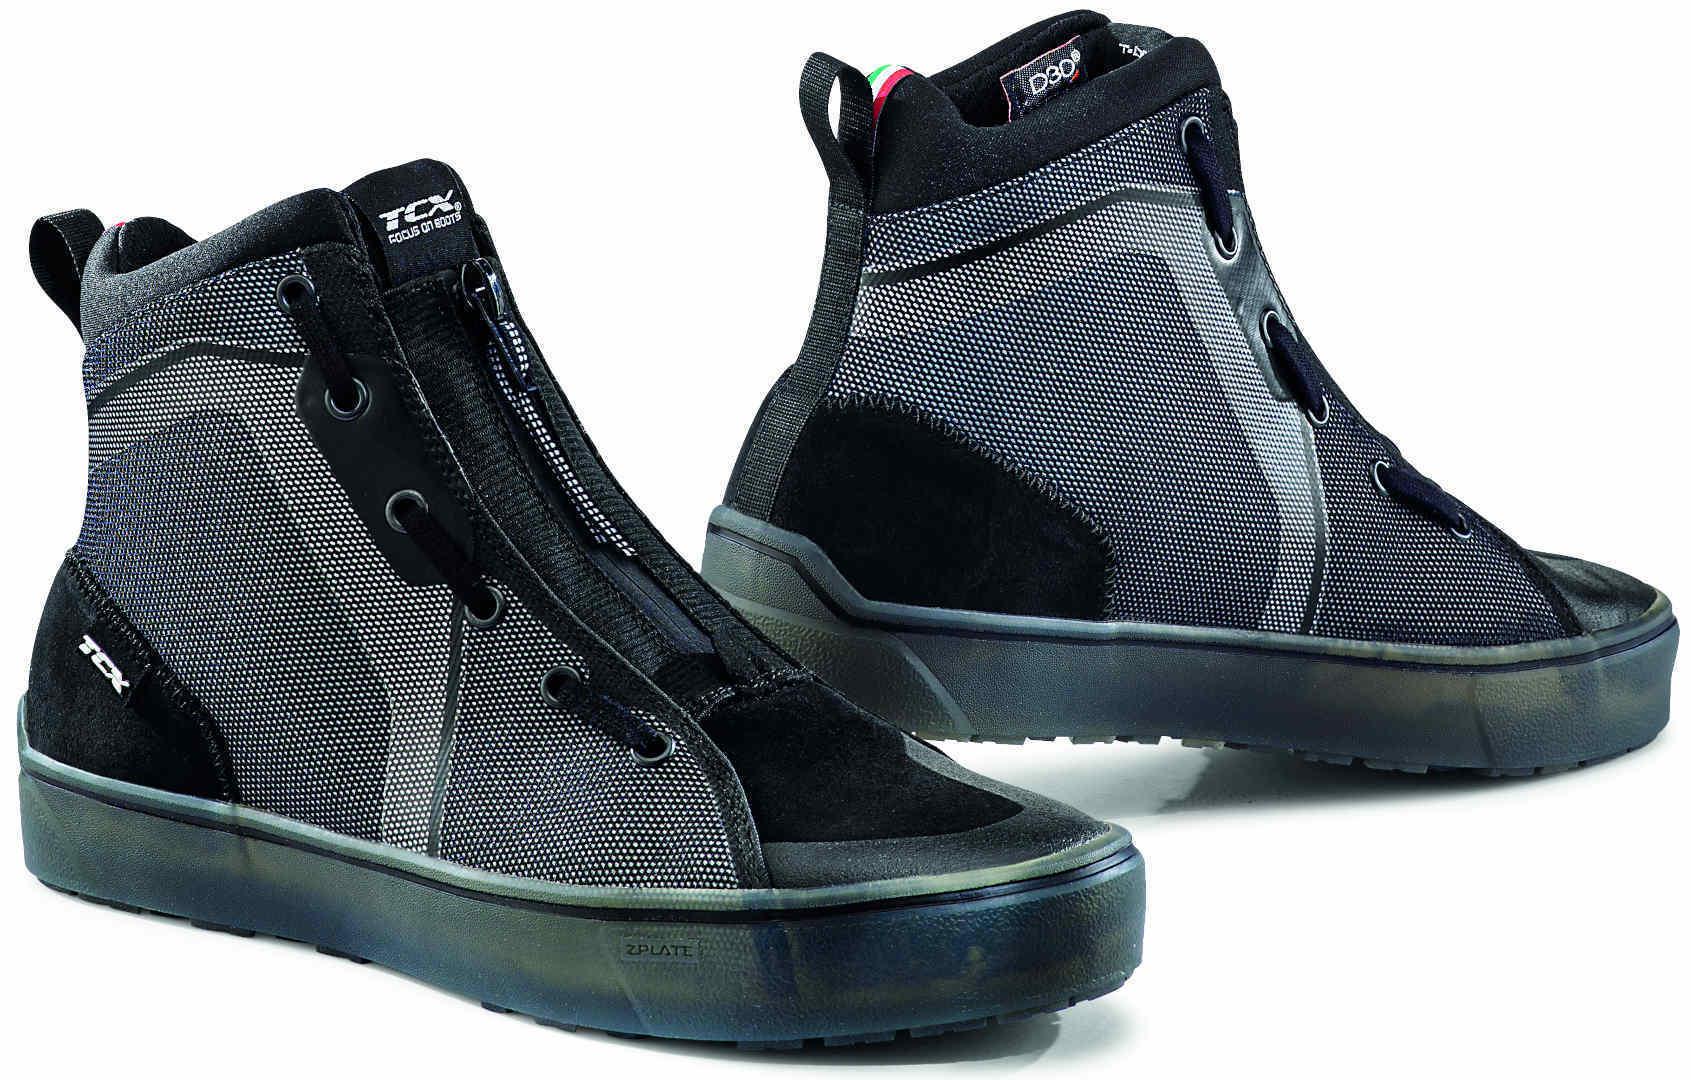 TCX Ikasu Wasserdichte Motorradschuhe, schwarz-silber, Größe 45, schwarz-silber, Größe 45